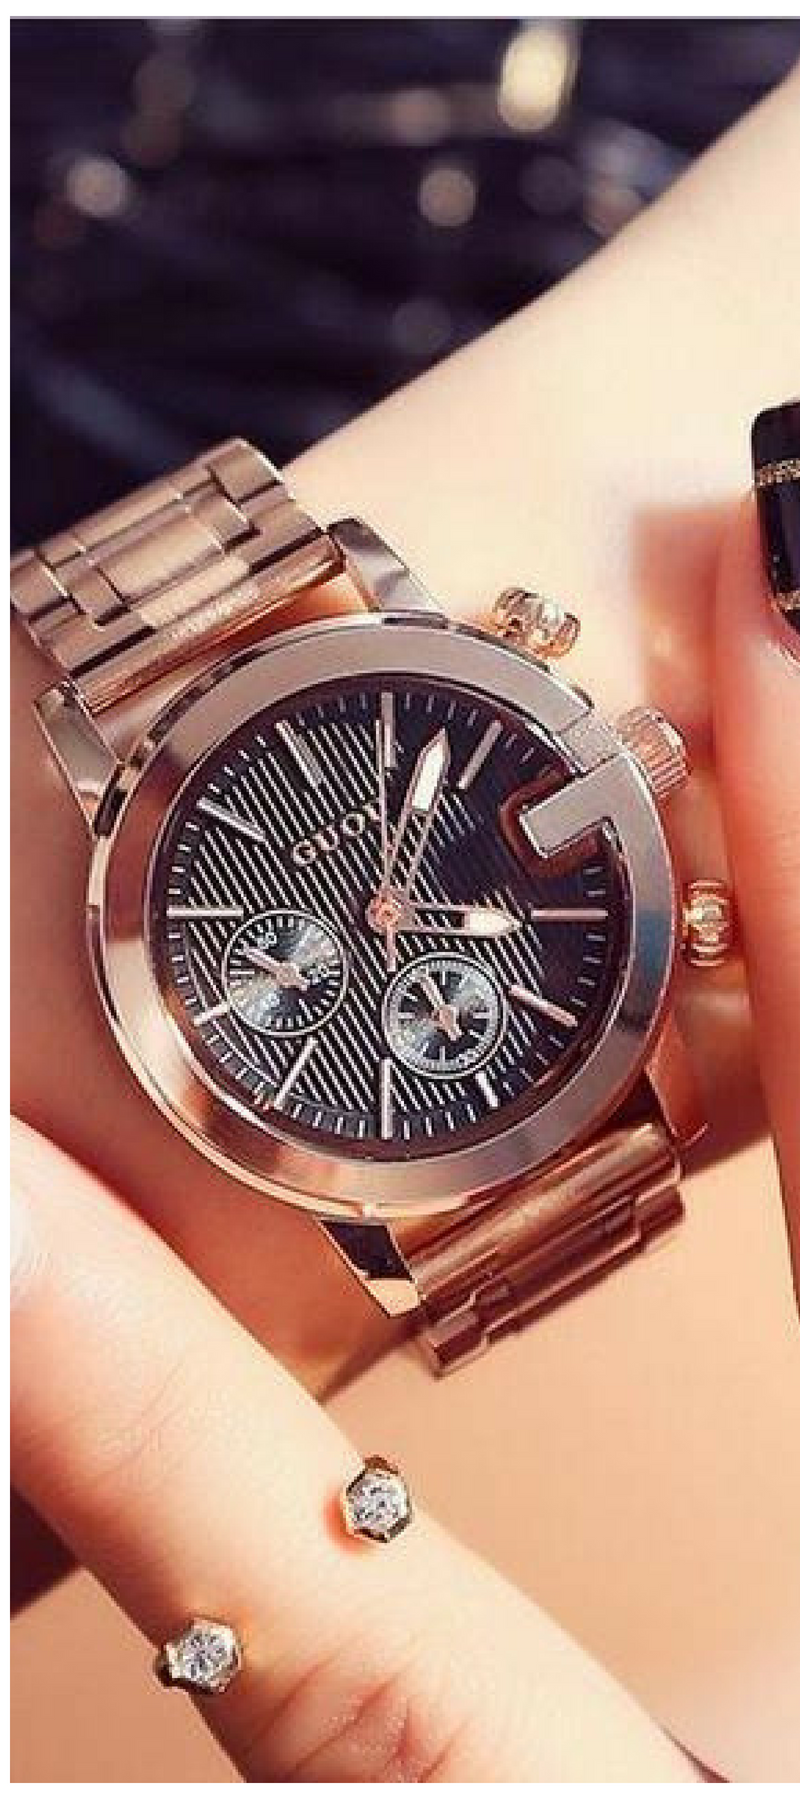 Guou luxury rose gold watch women watches fashion womenus watches